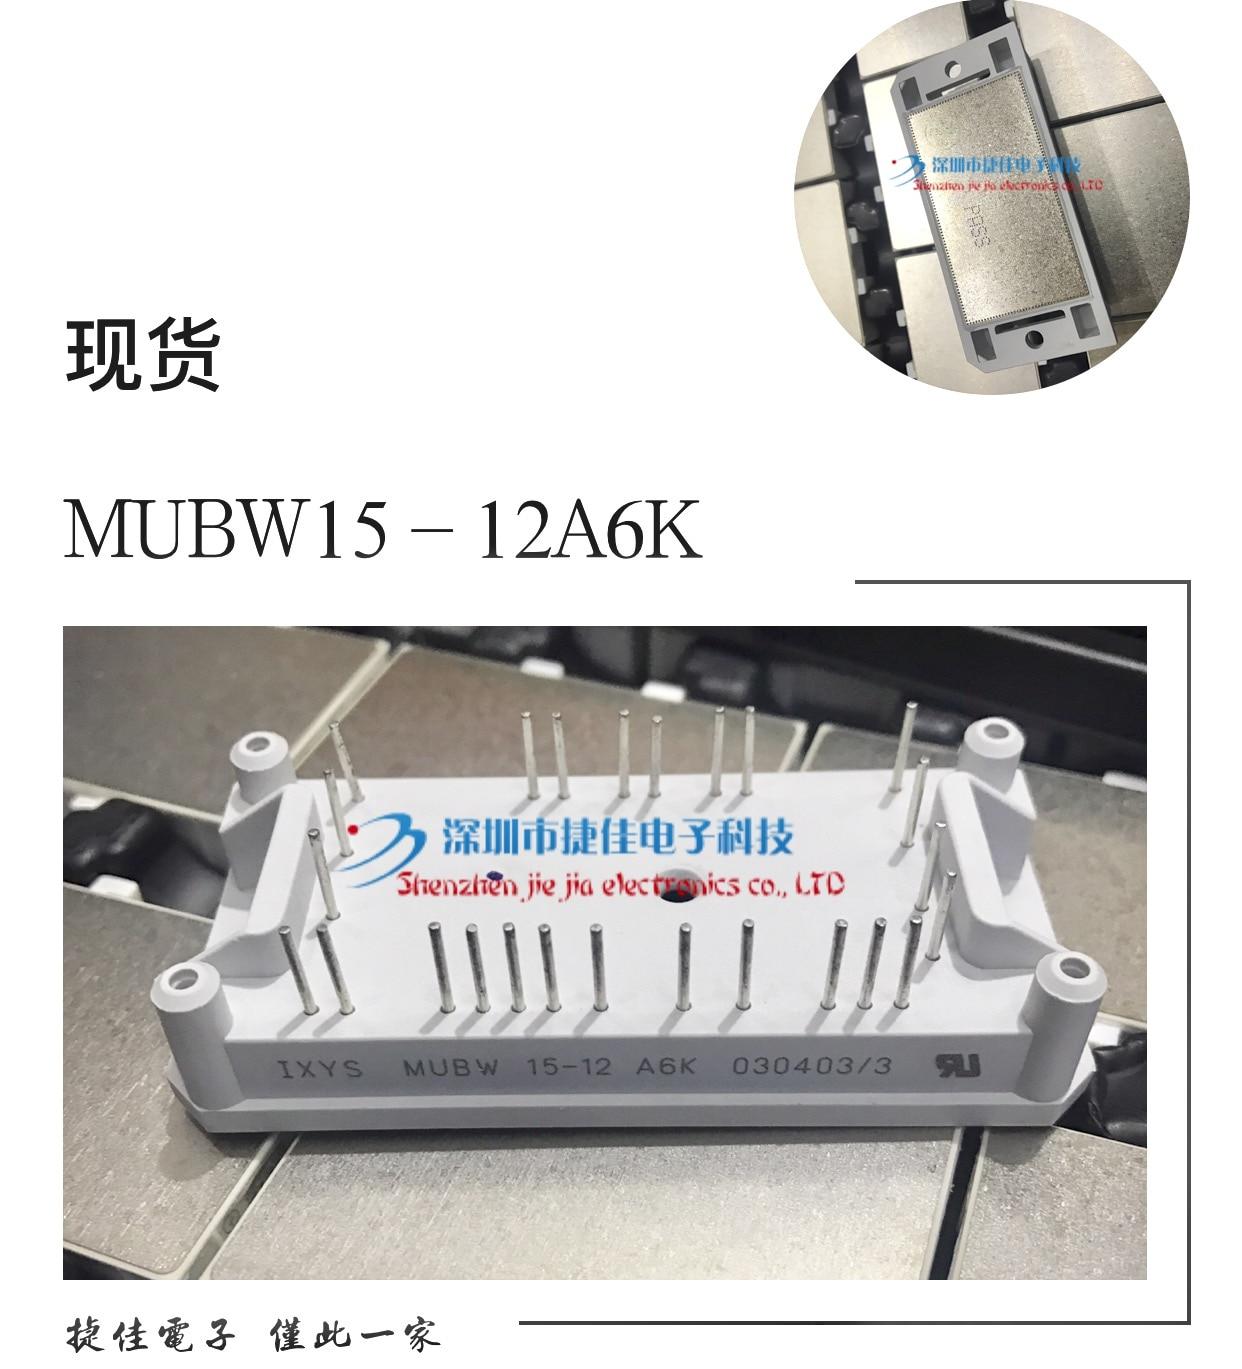 MUBW15-12A6K MUBW20-12A6K MUBW30-12A6K MUBW35-12A6K 06A6